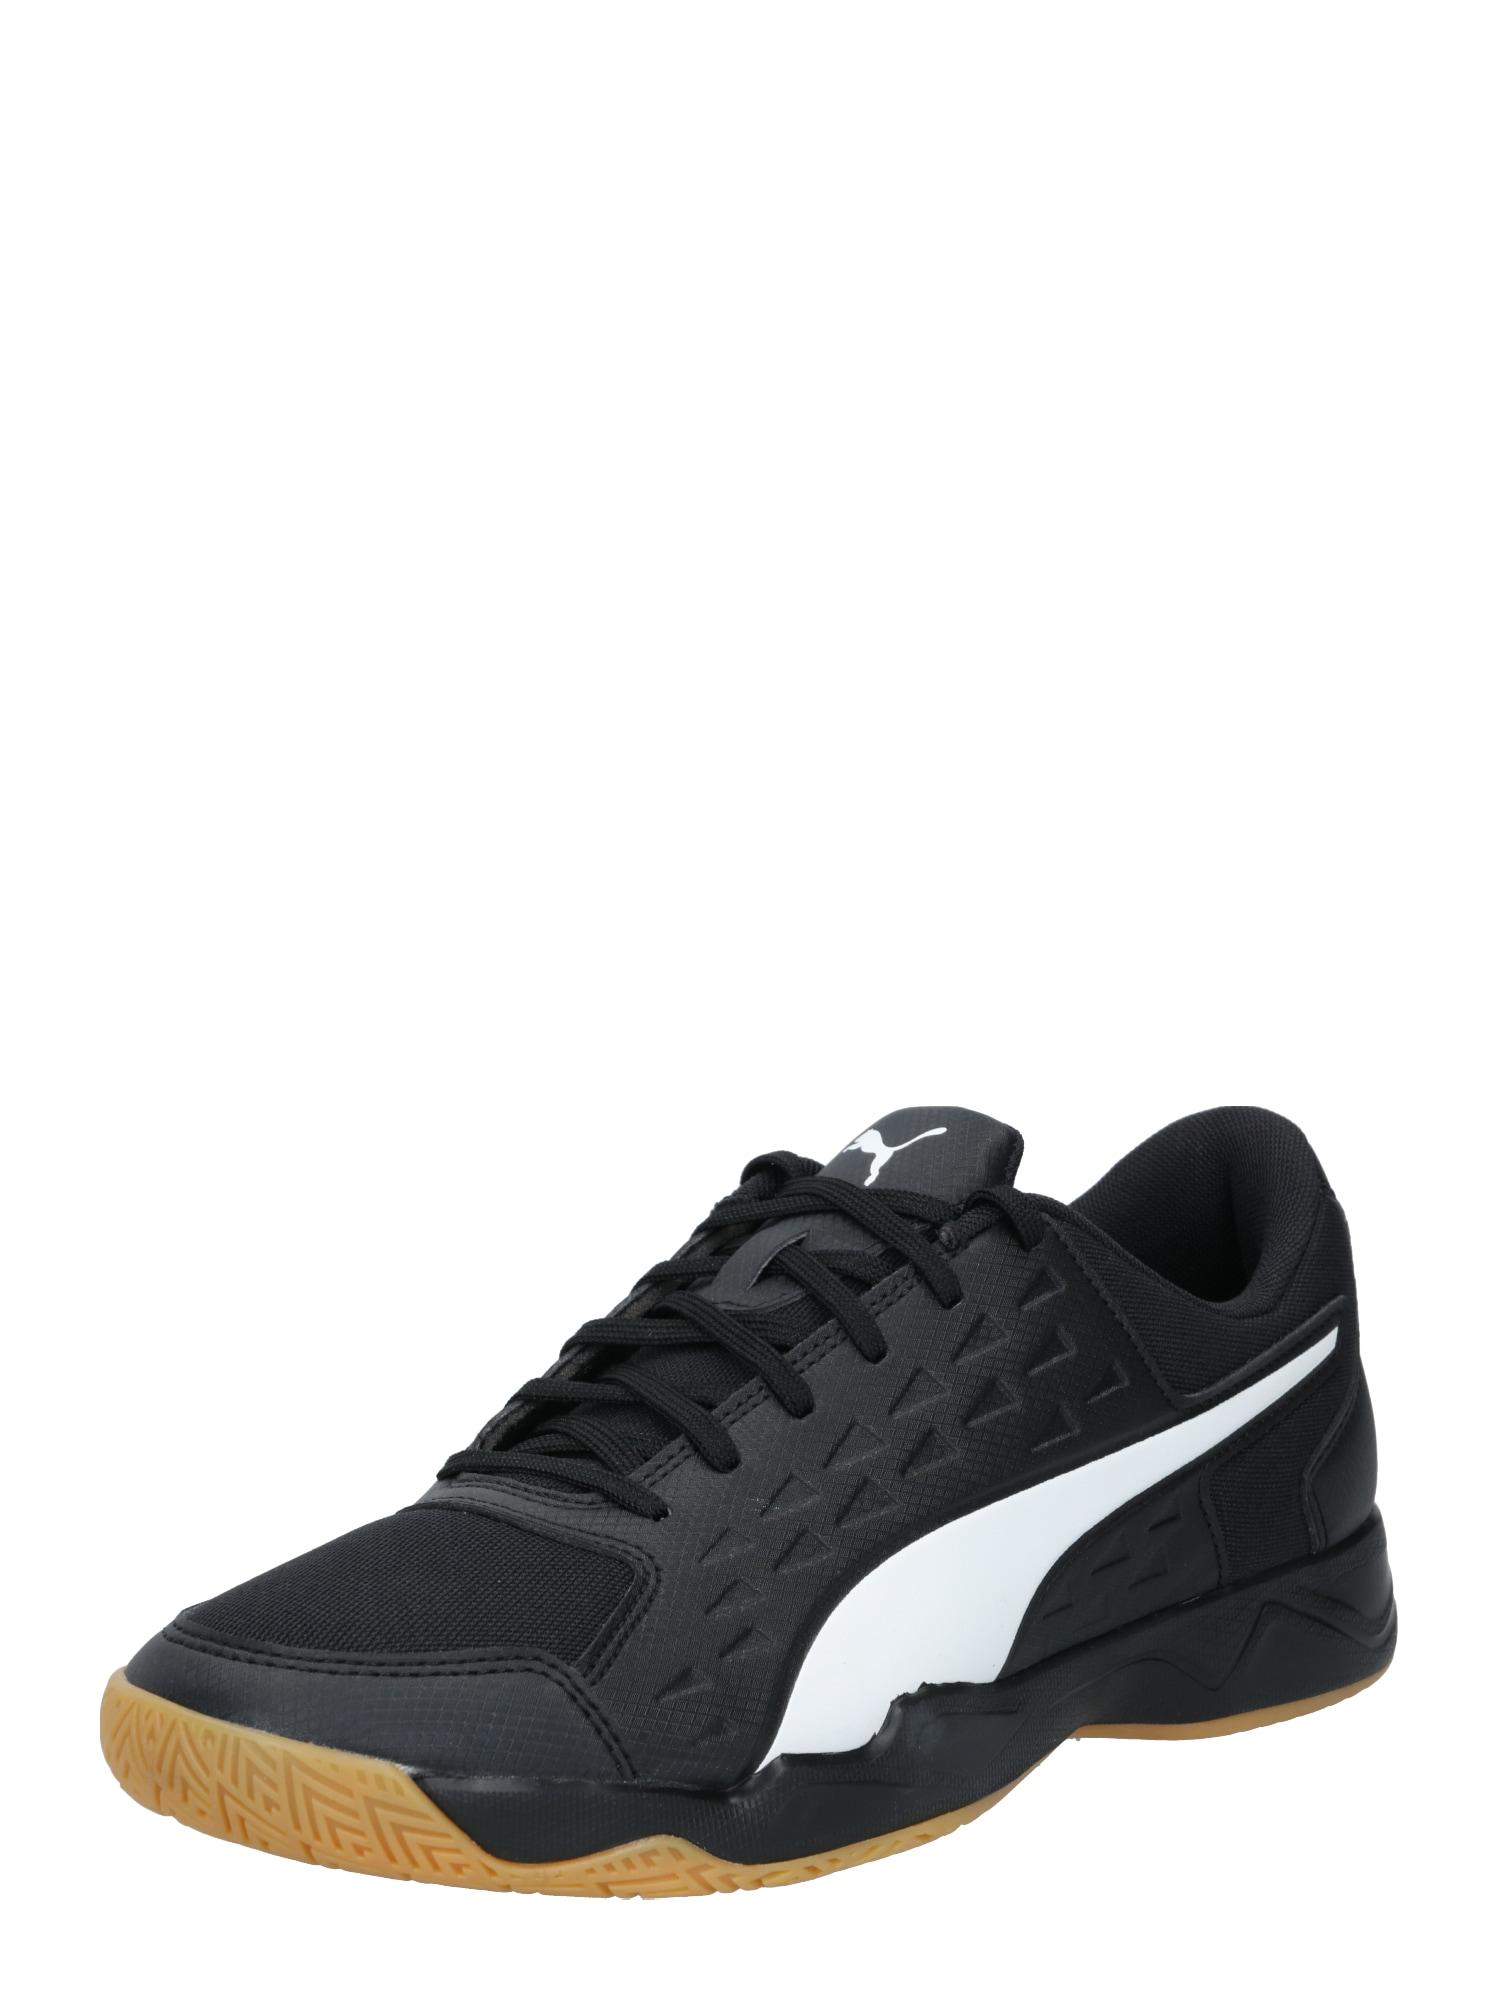 PUMA Scarpa sportiva 'Auriz'  bianco / nero male shop the look